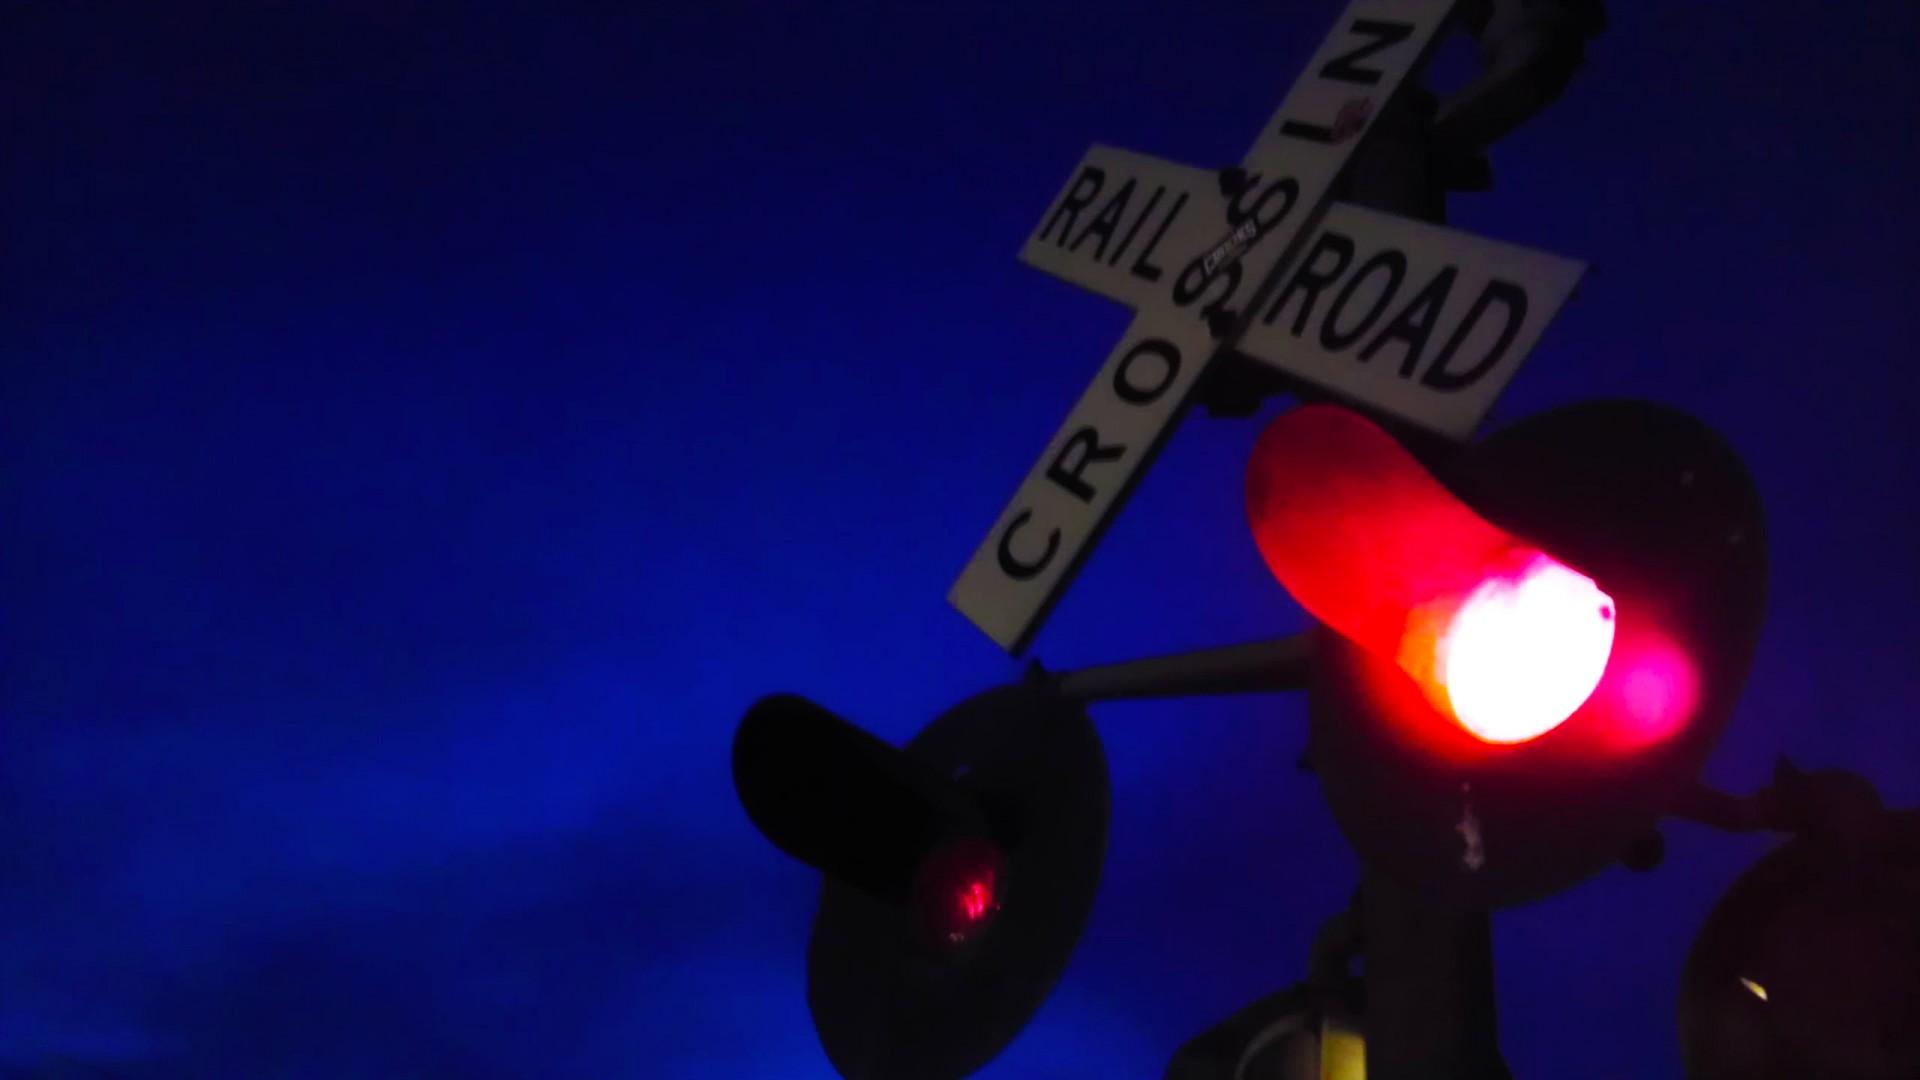 Night,railroad,lights,train,crossing - free photo from